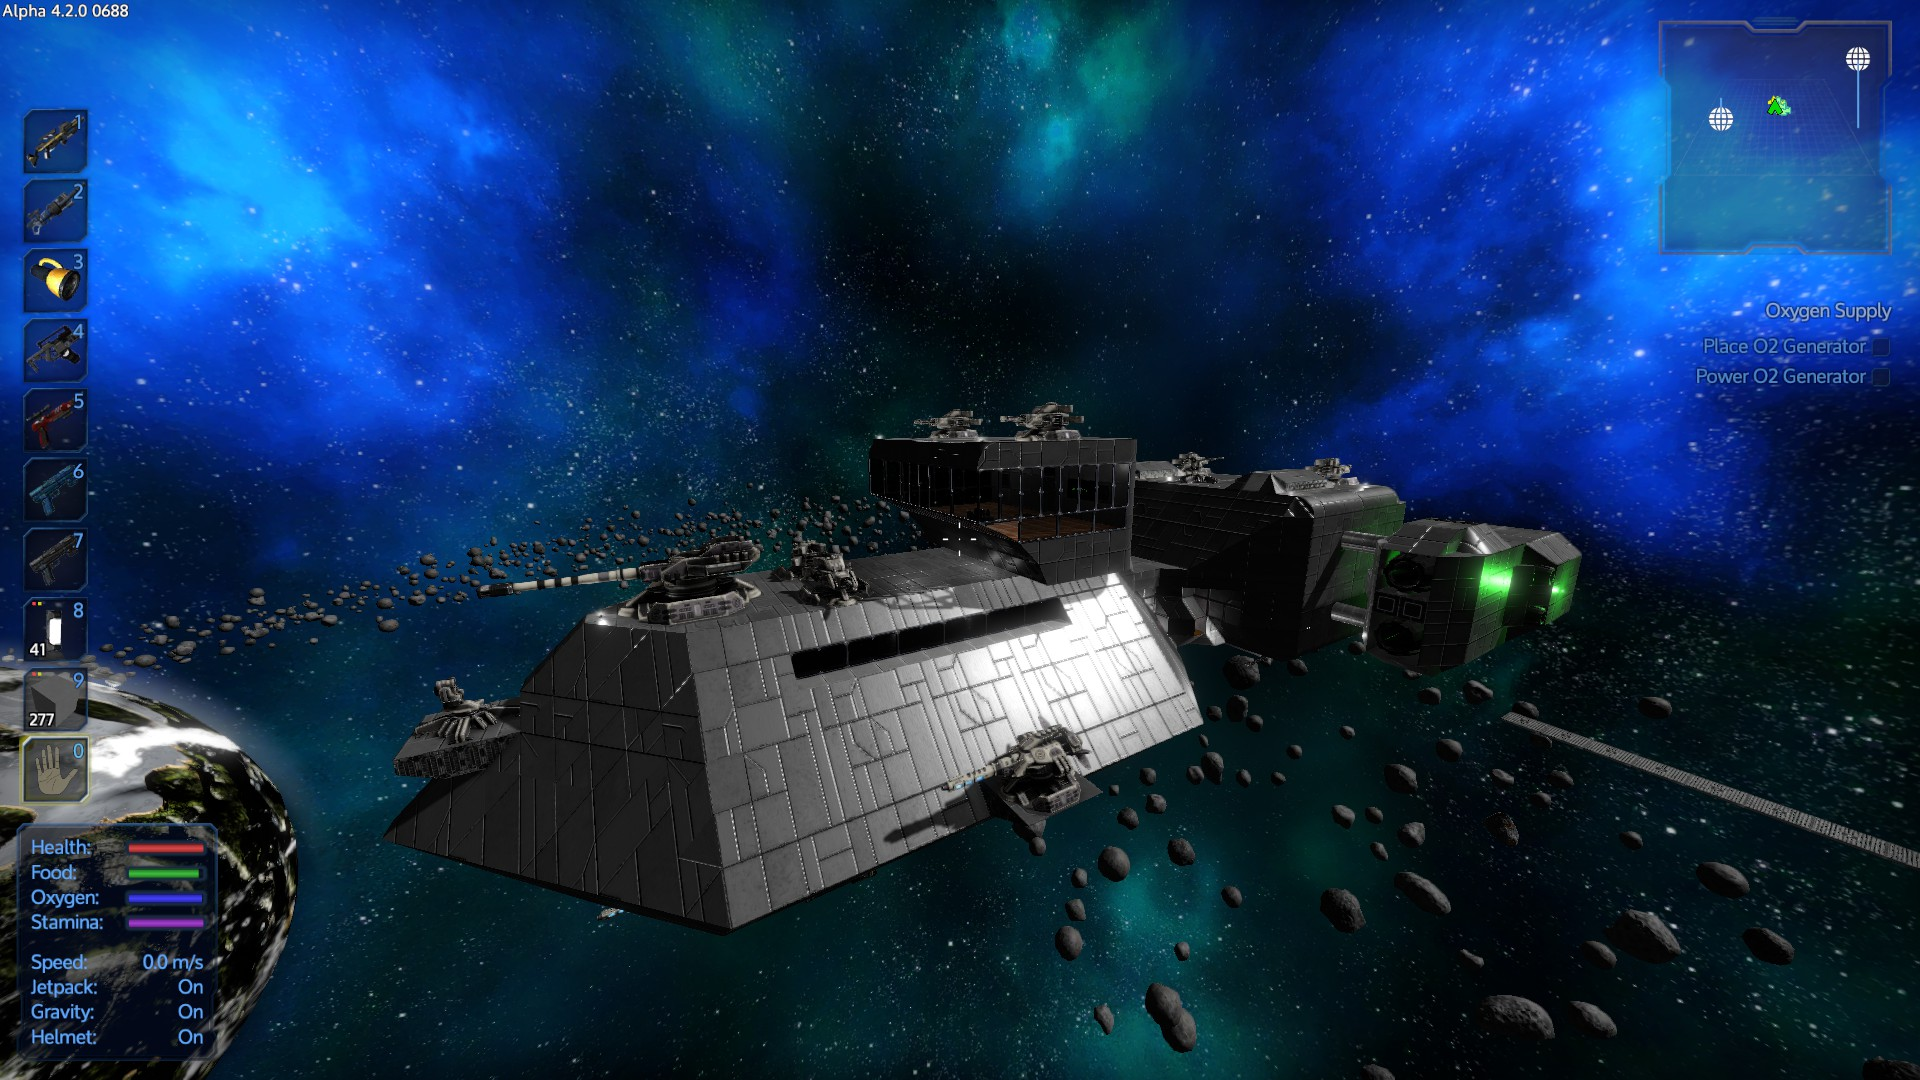 Empyrion - Galactic Survival kickstarter | SpaceBattles Forums